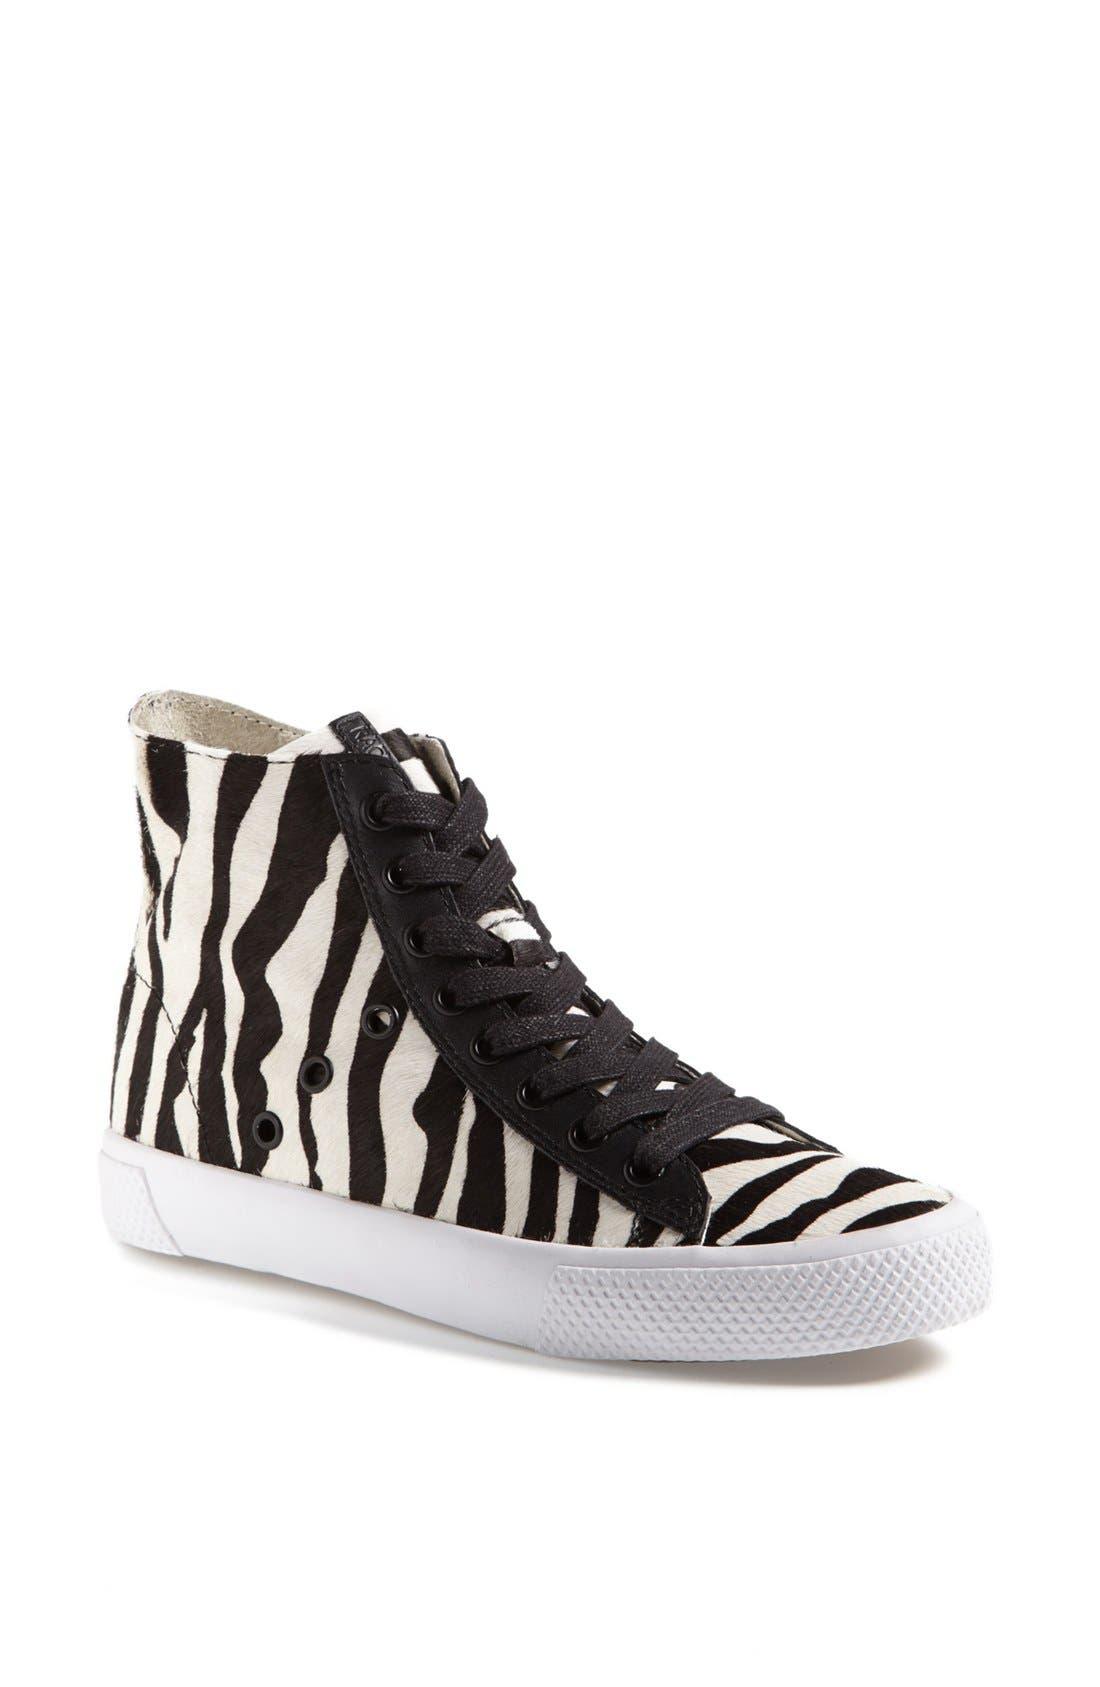 Alternate Image 1 Selected - Rachel Zoe 'Barret' Zebra Print Calf Hair Sneaker (Online Only)